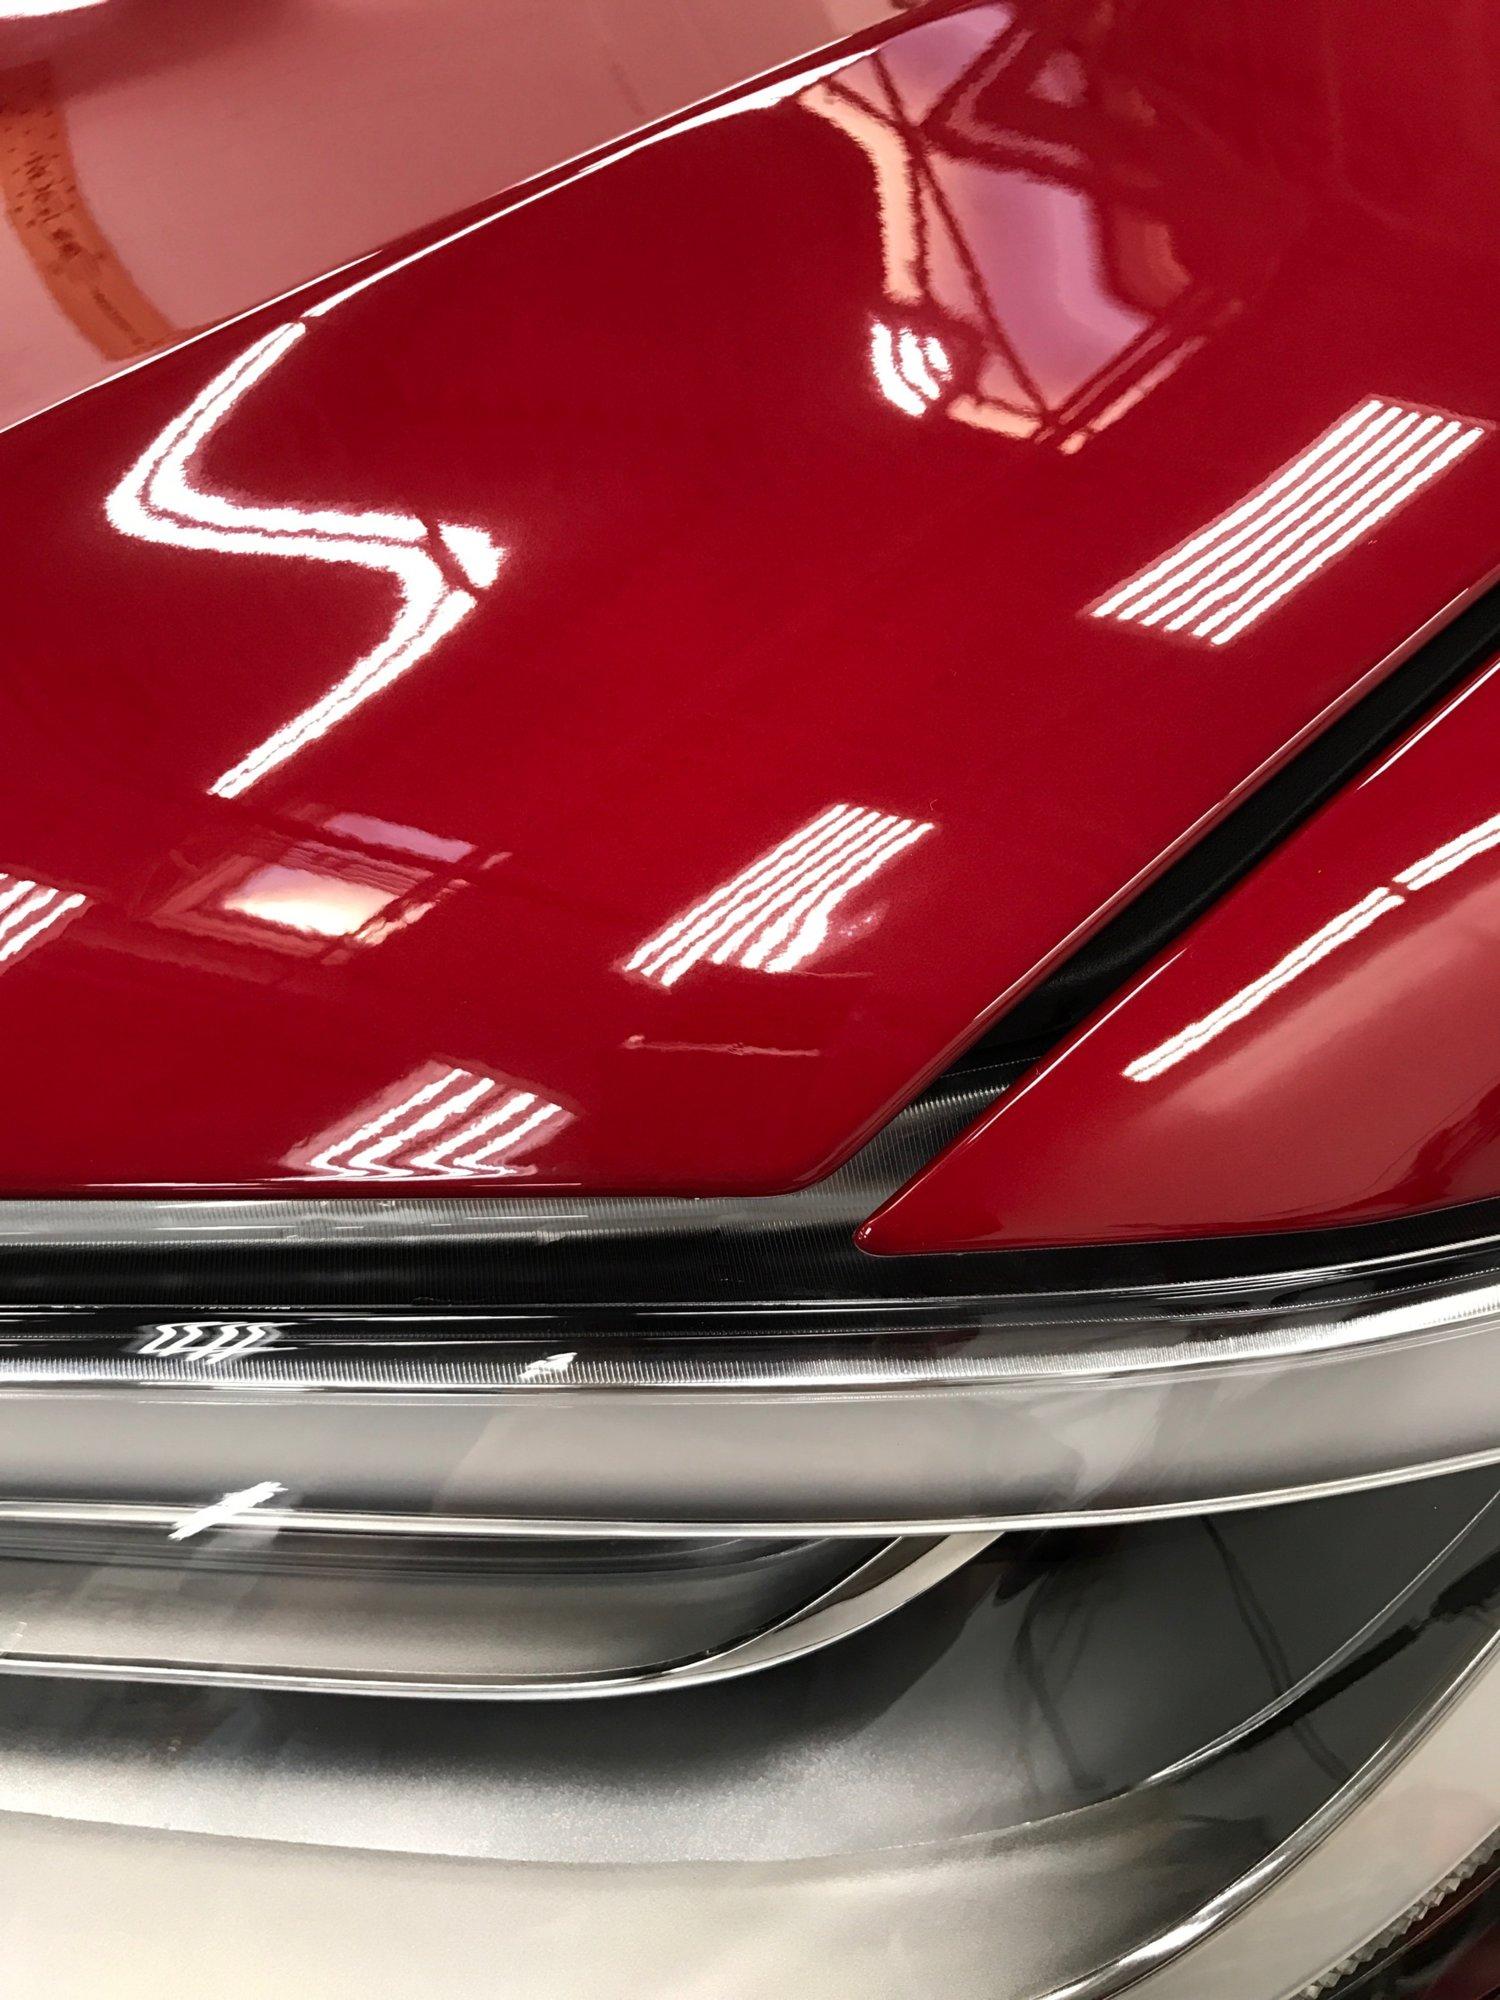 02 - Wrapped car headlight & hood.jpg